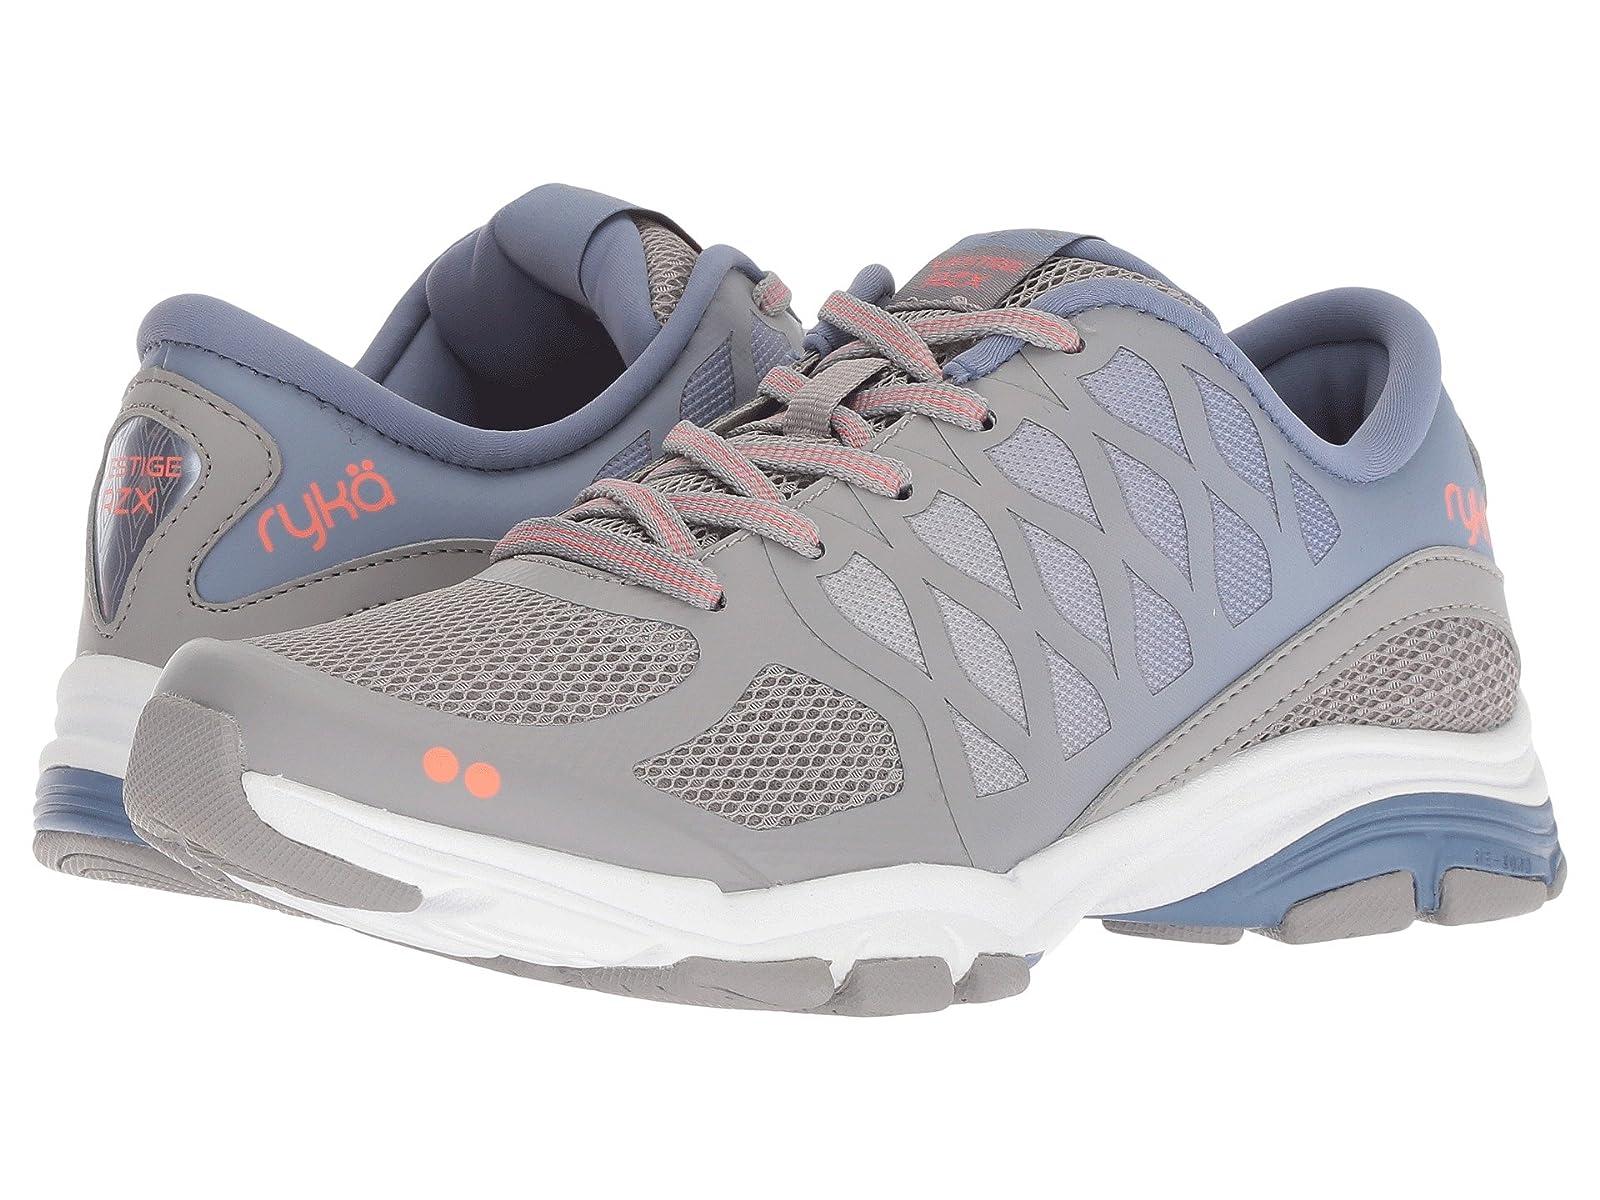 Ryka Vestige RZXAtmospheric grades have affordable shoes